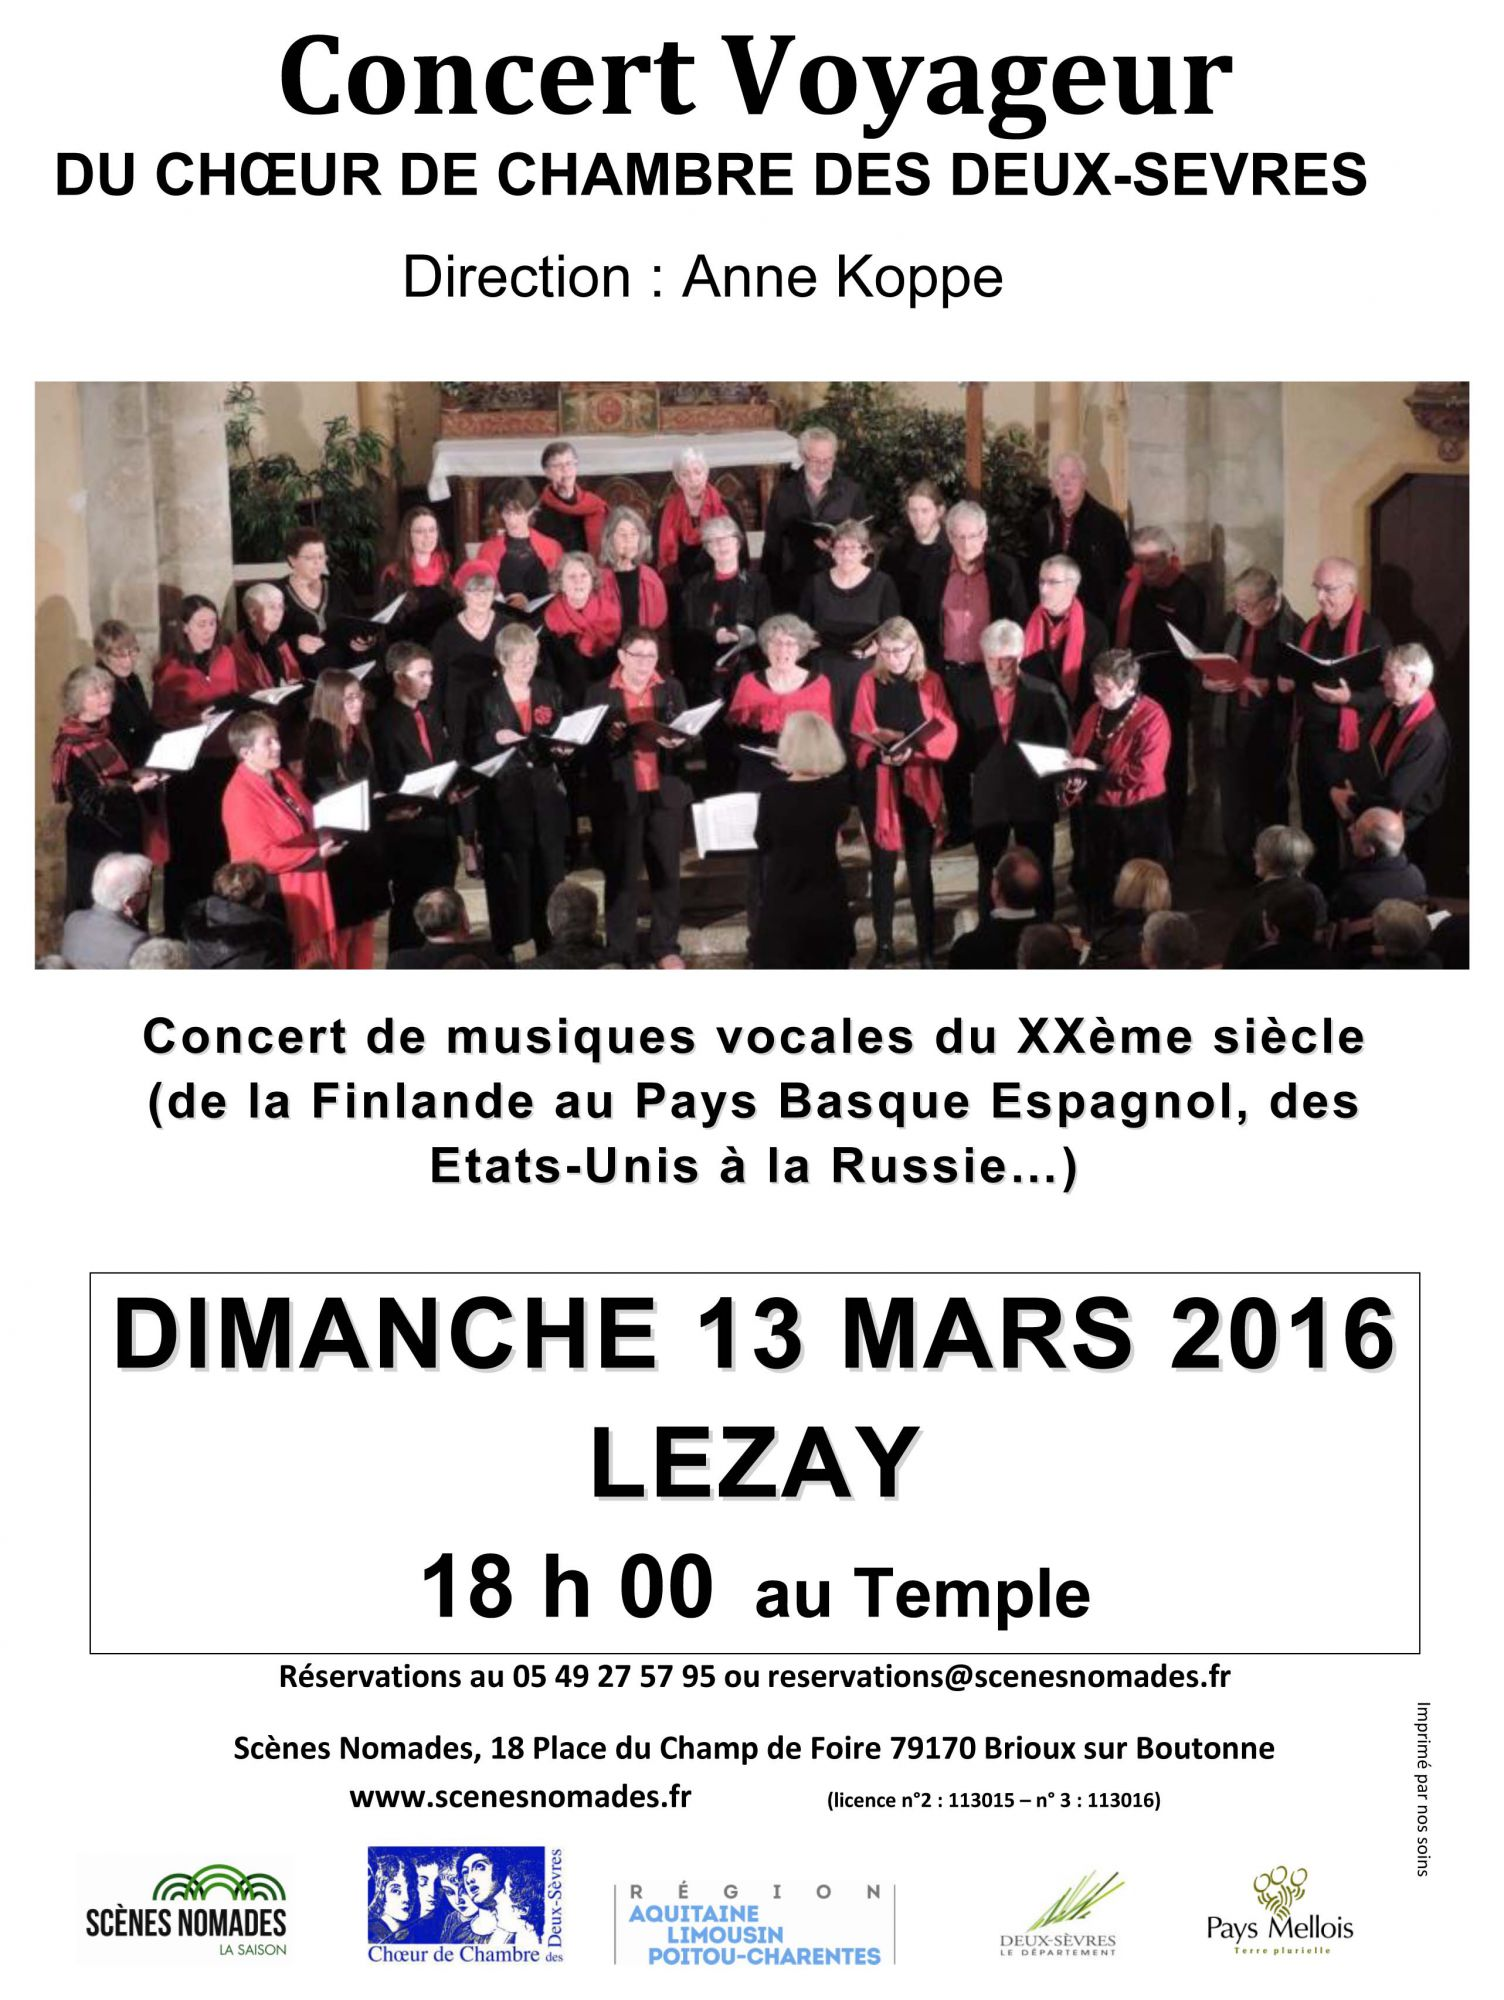 Concert voyageur, Lezay mars 2016